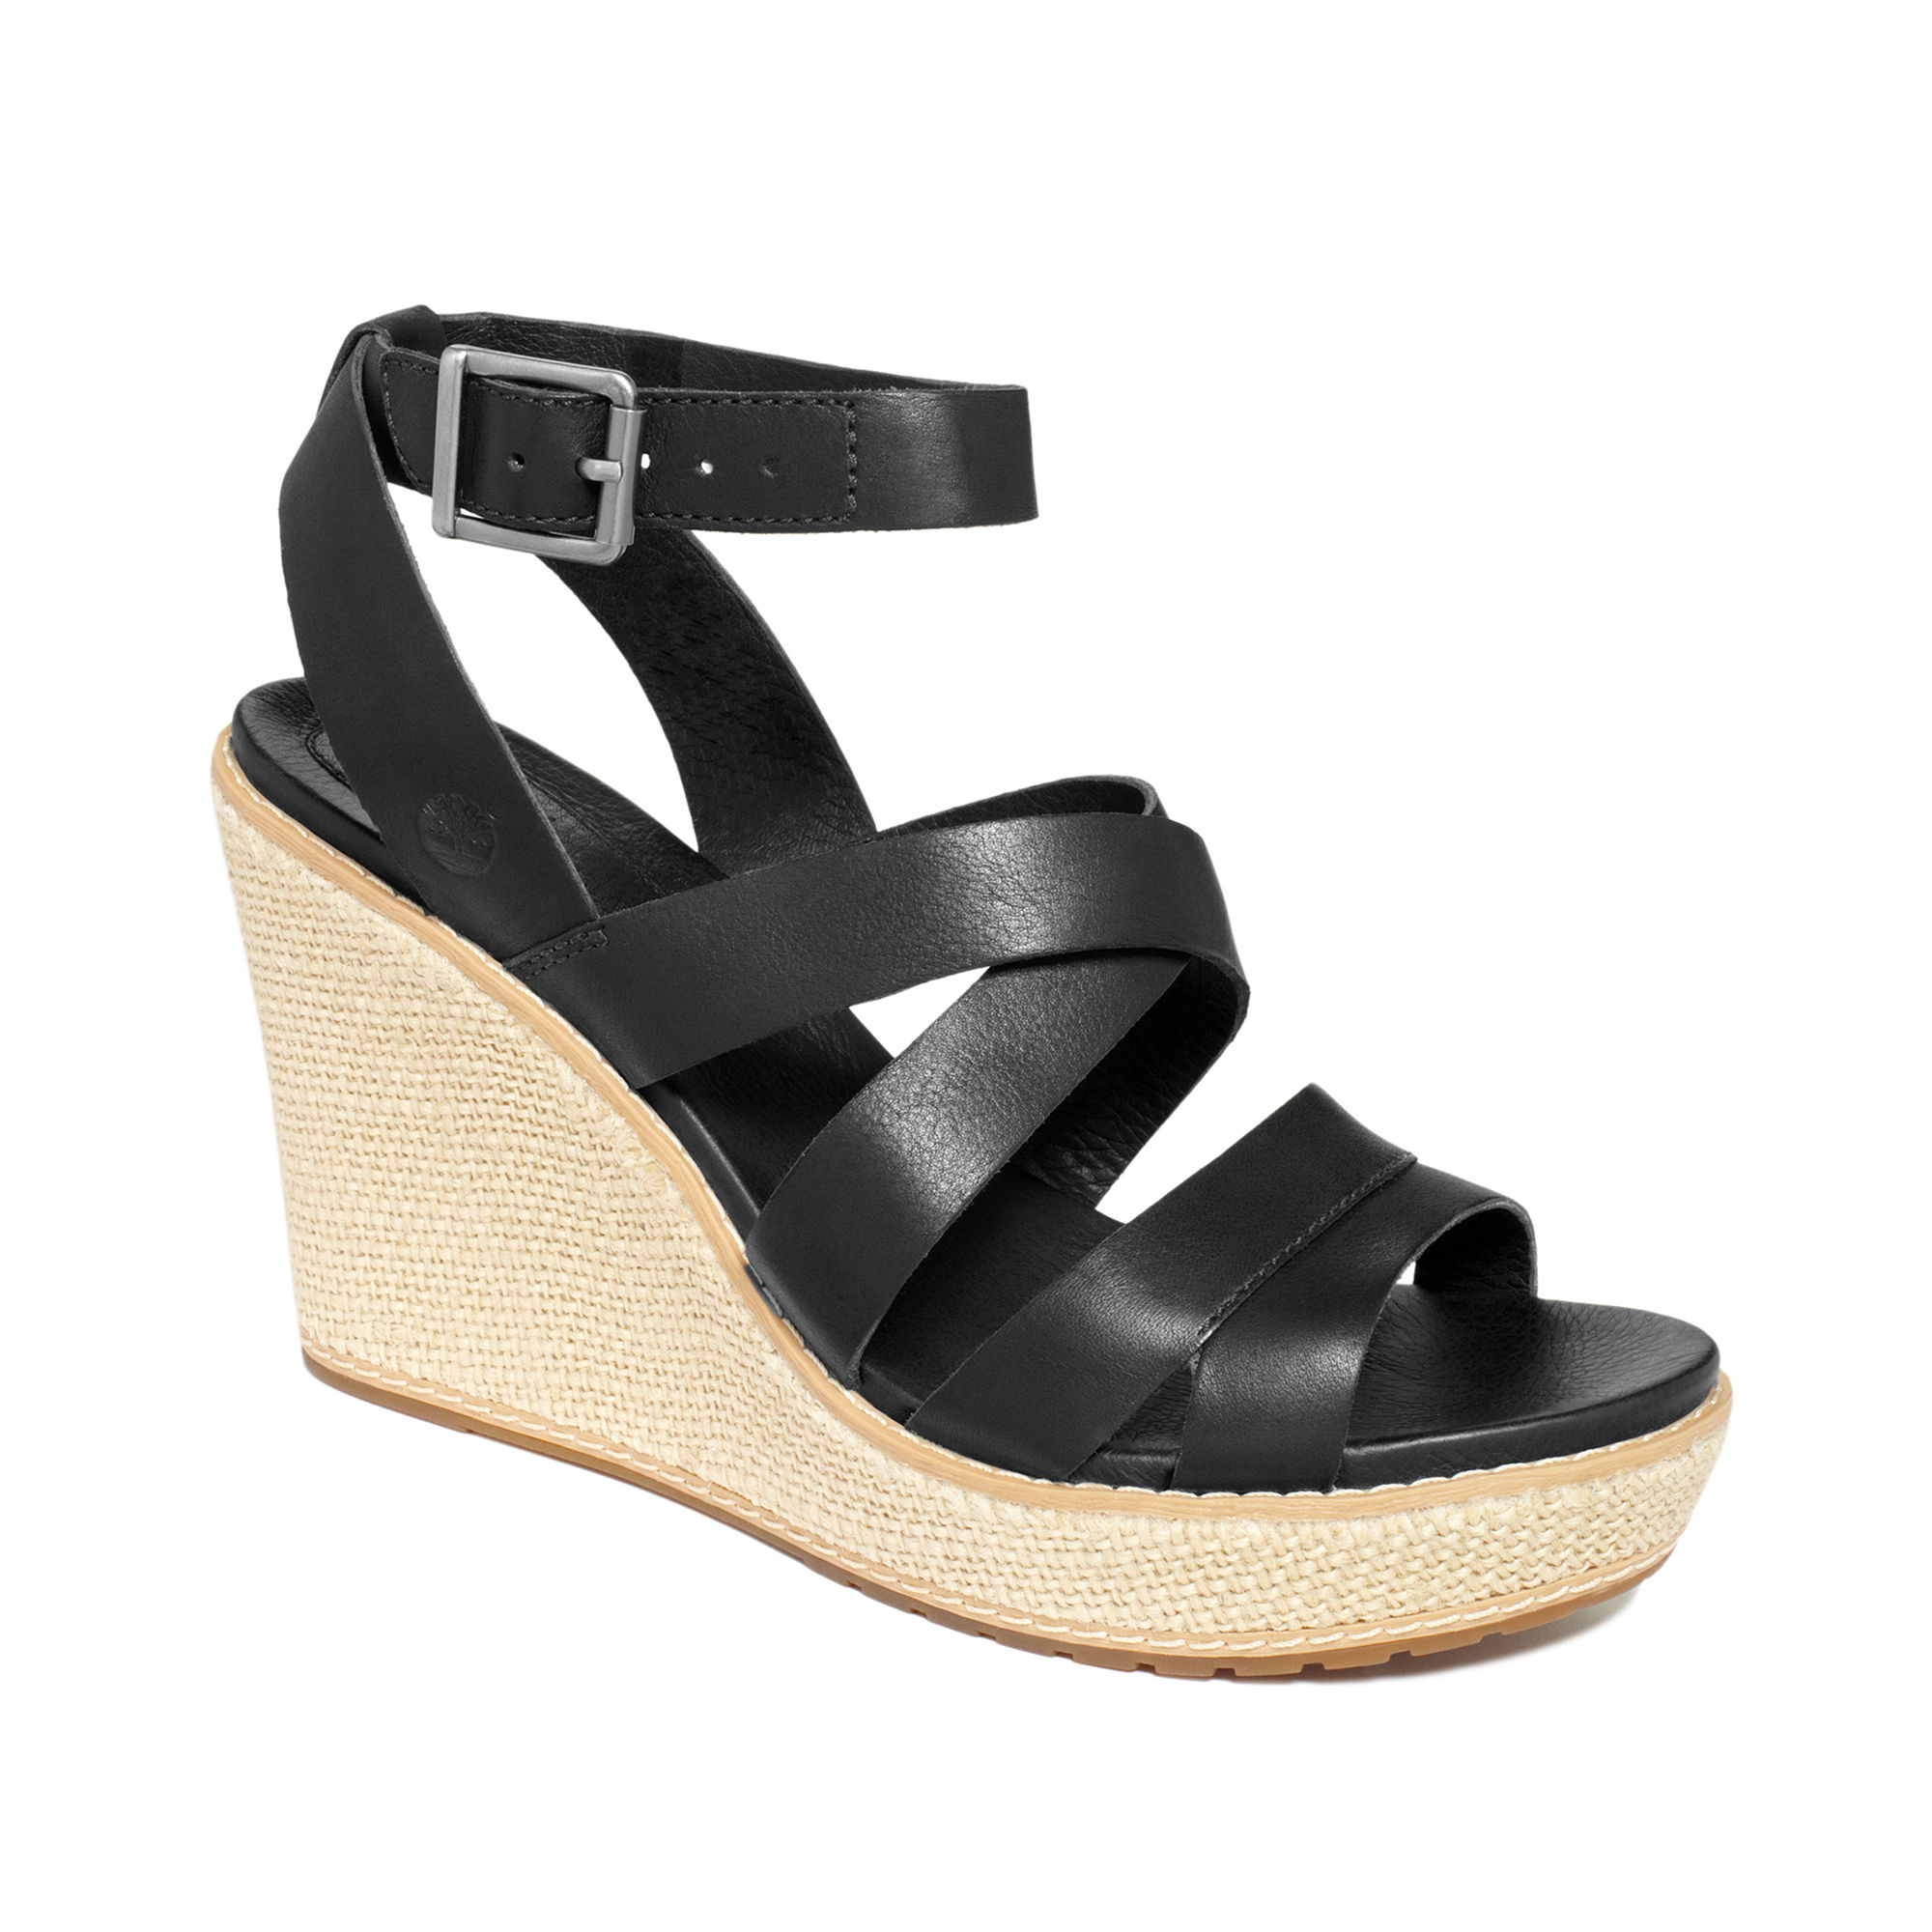 timberland danforth platform wedge sandals in black lyst